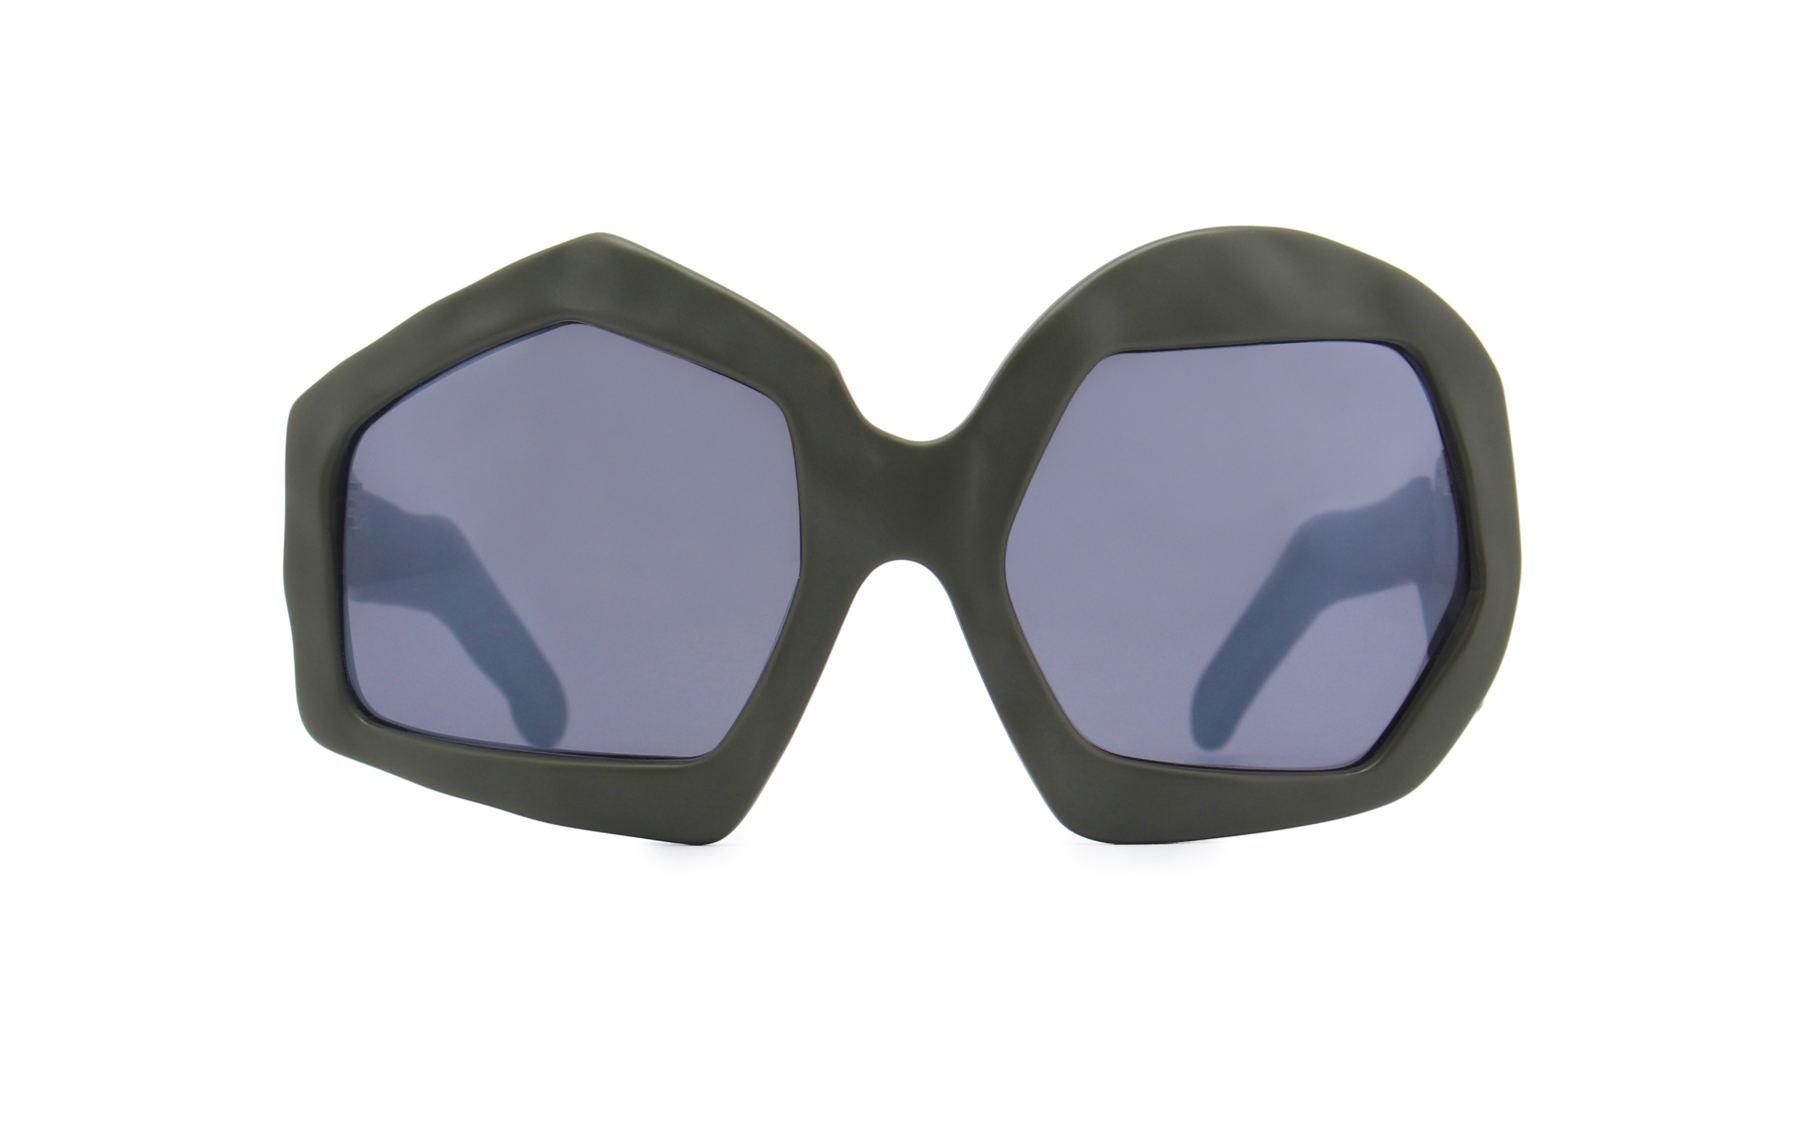 FAKBYFAK x Walter Van Beirendonck  Thunder Sunglasses. Military Green Code: FBF-09-12-04